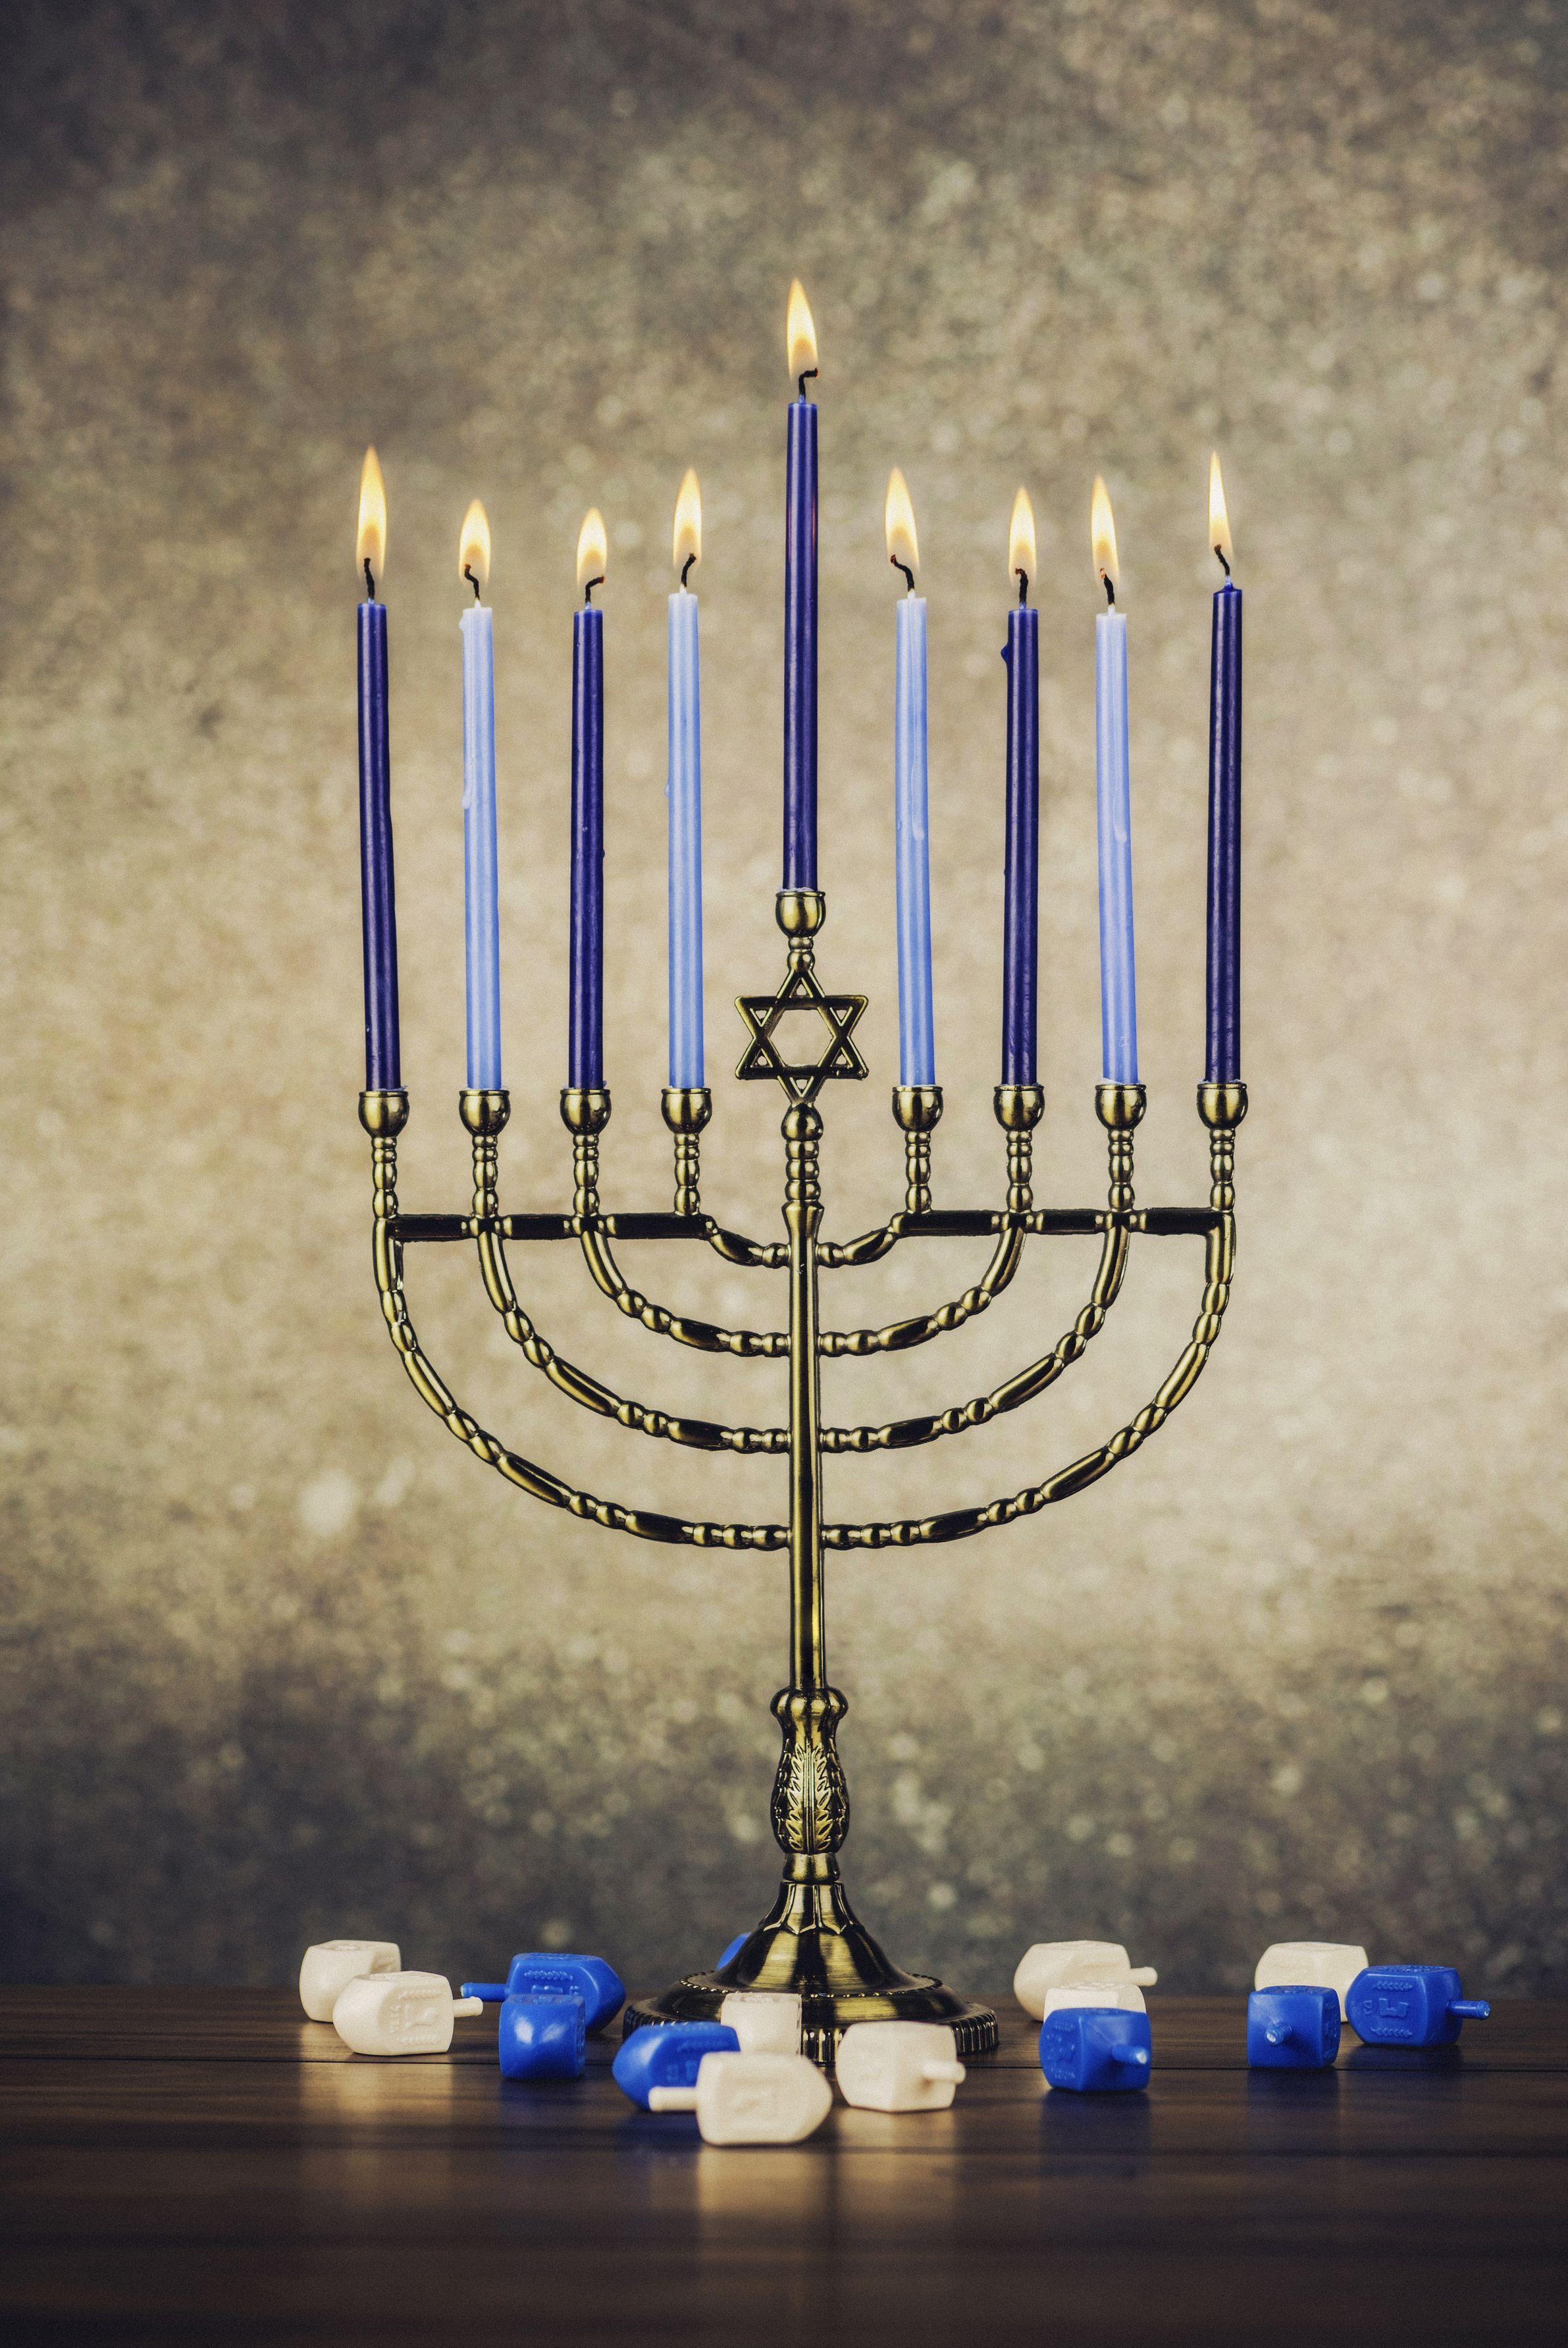 Menorah with Burning Candles for Hanukkah